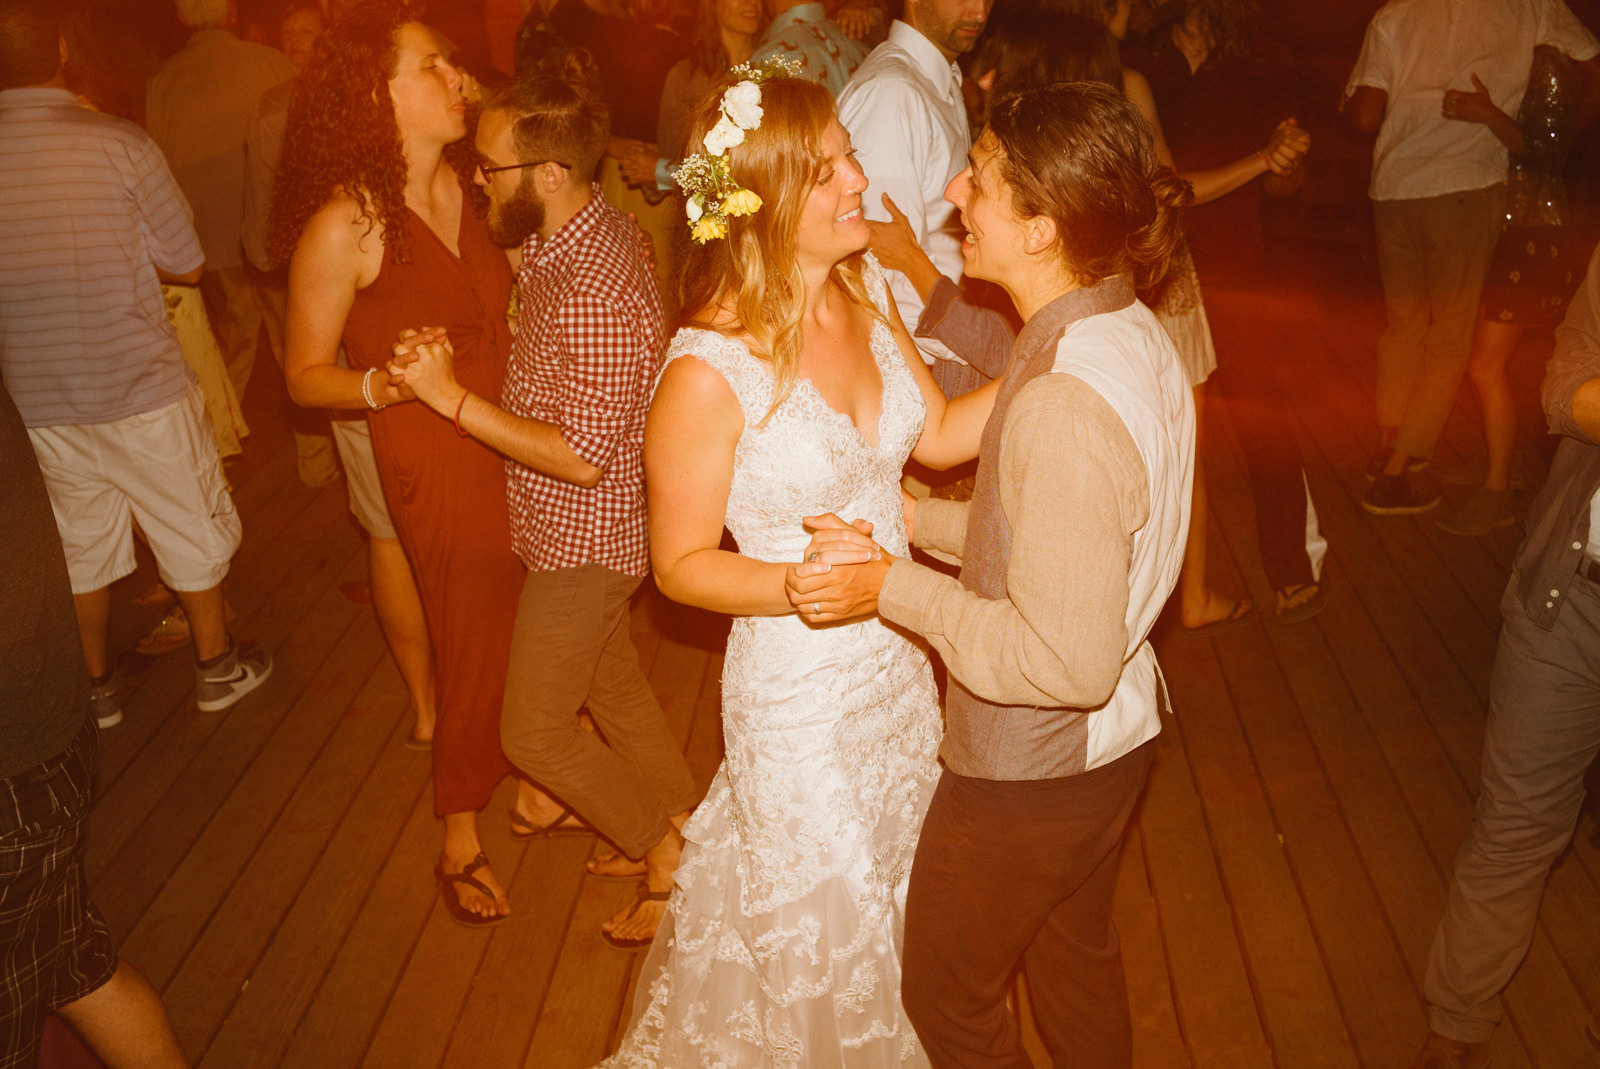 rivers-bend-retreat-wedding-122 RIVER'S BEND RETREAT WEDDING